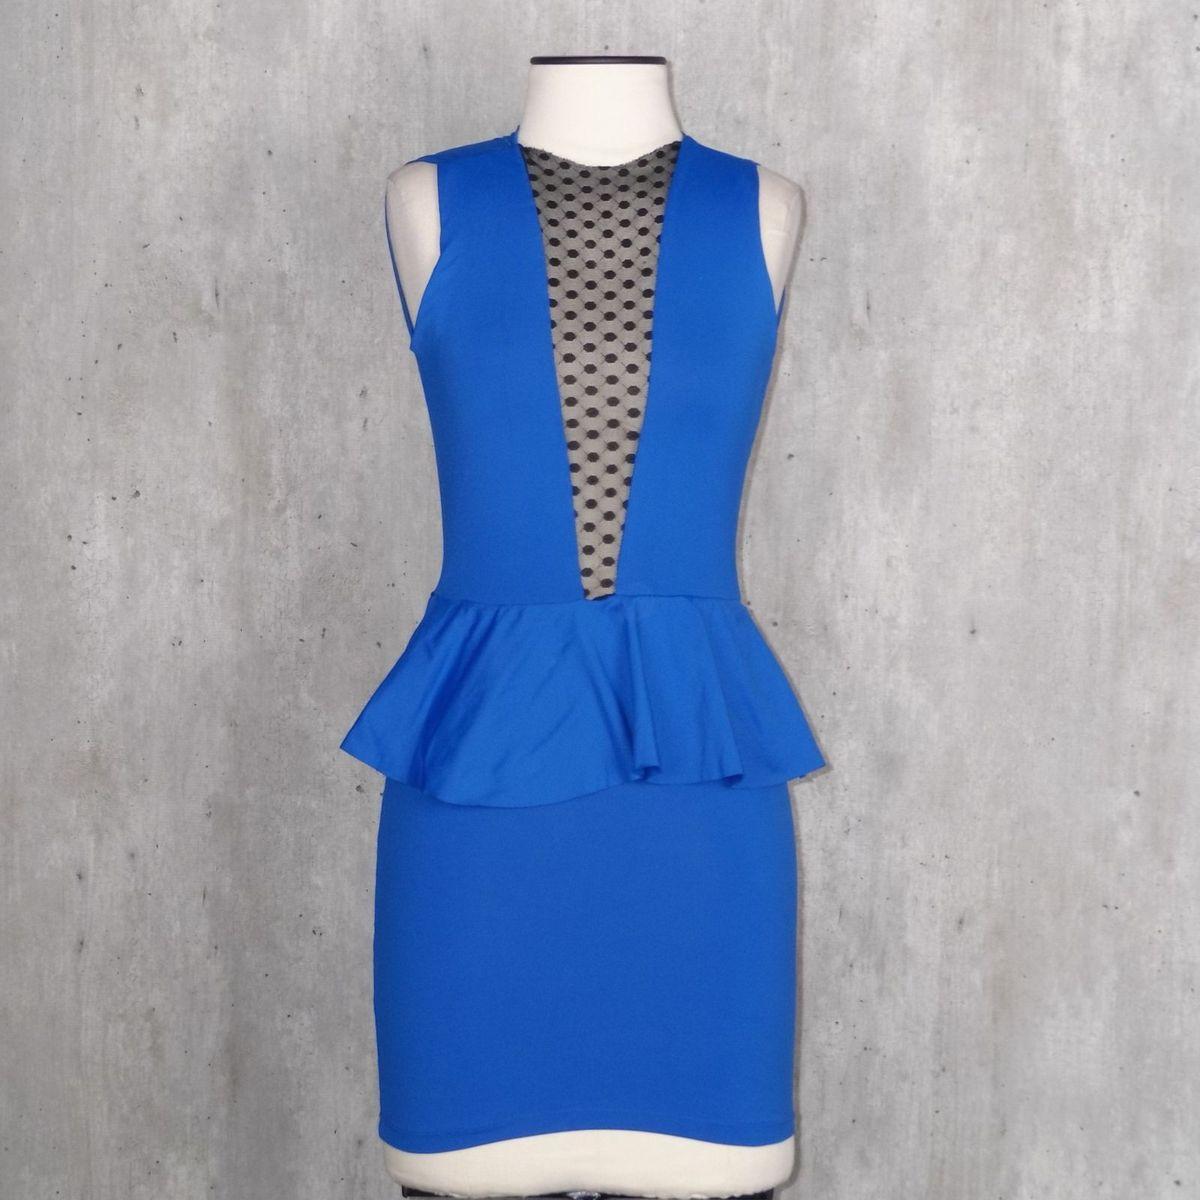 ebdc9b3b89 Vestido Tubinho Azul